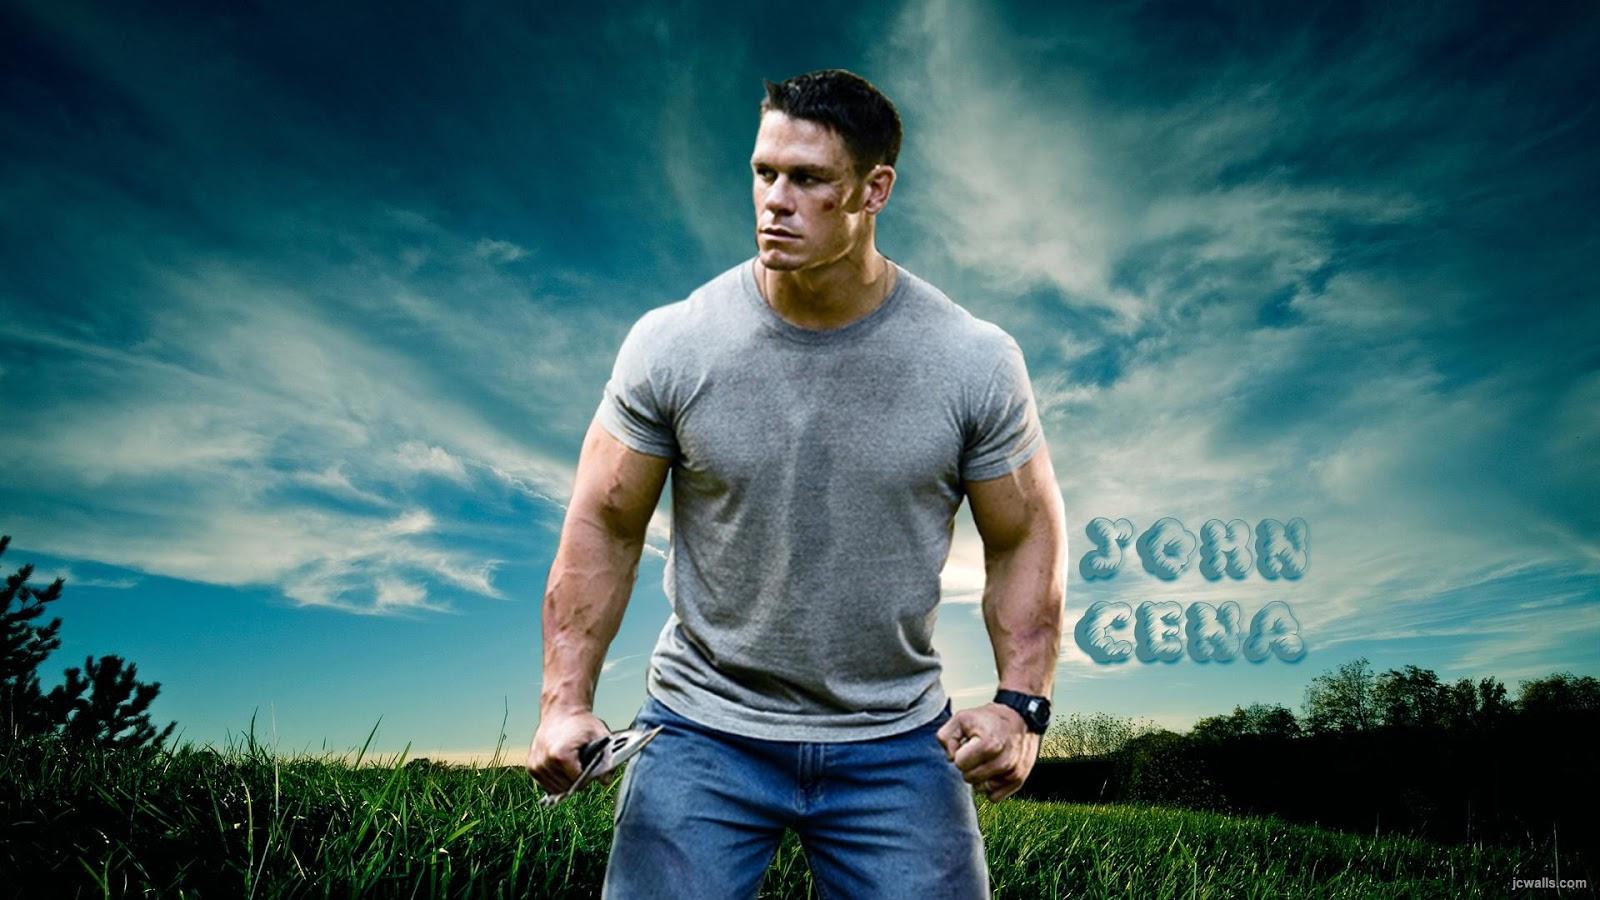 Wallpaper HD of WWE Star John Cena